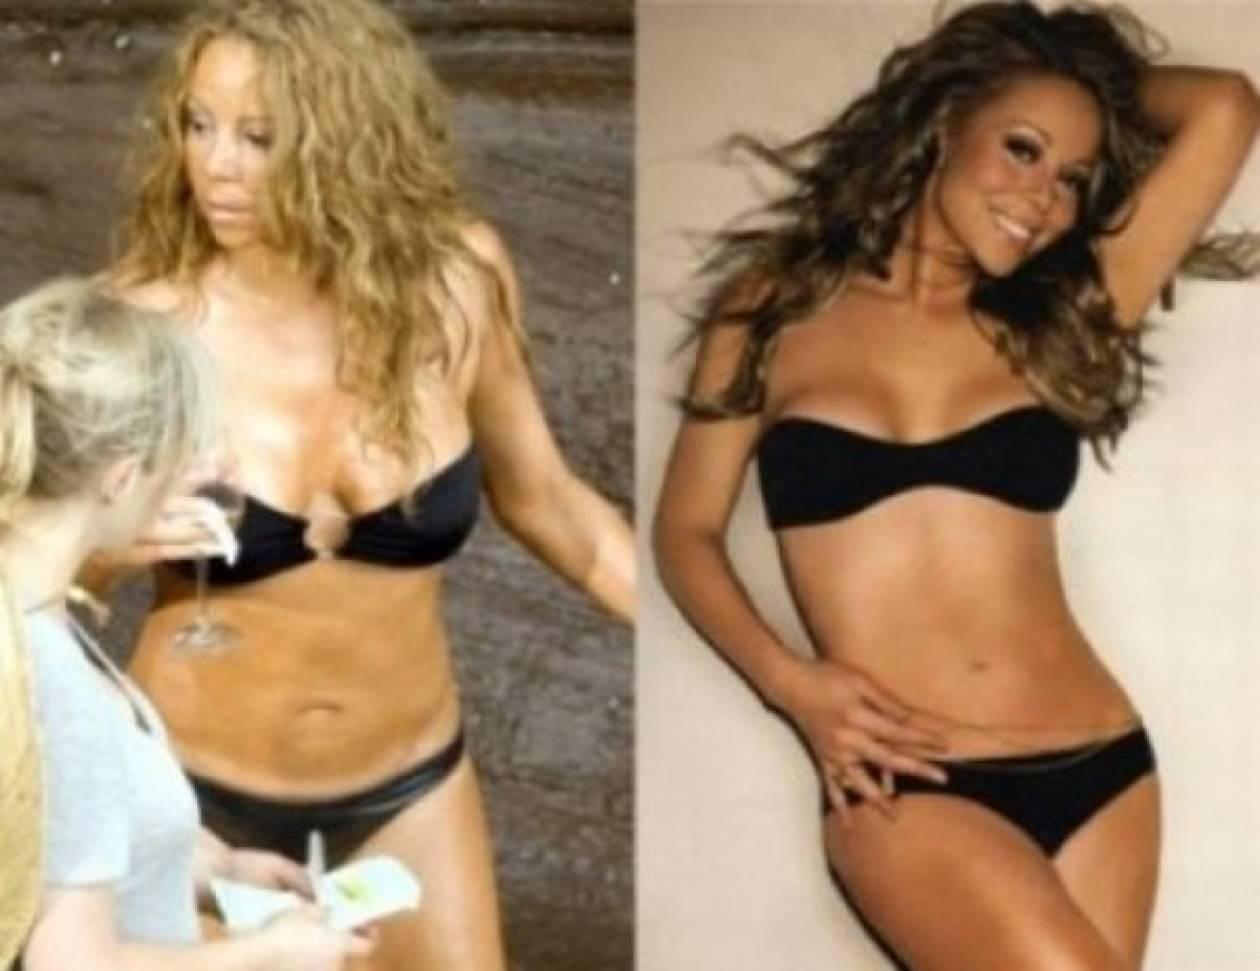 Stars πριν και μετά το ρετούς στην εικόνα τους